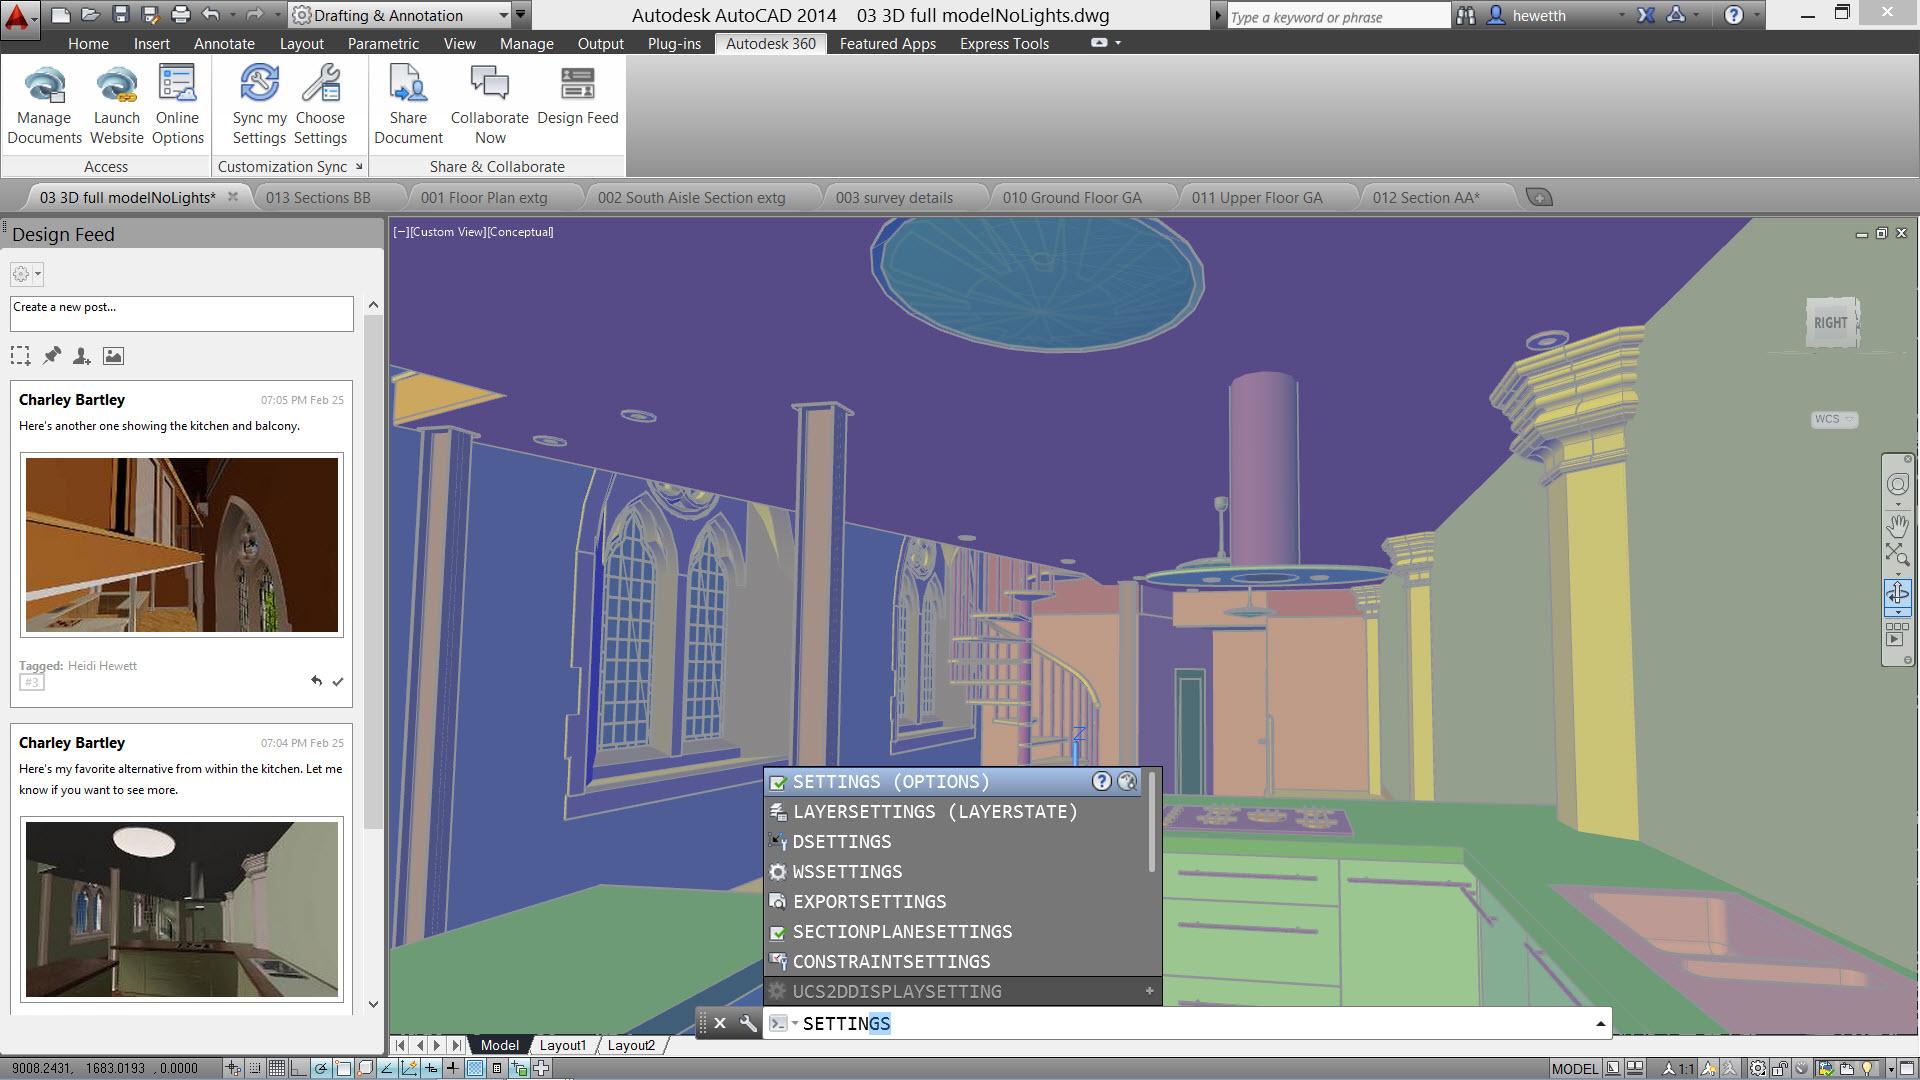 Software proiectare generala - Autodesk AutoCAD AUTODESK - Poza 1